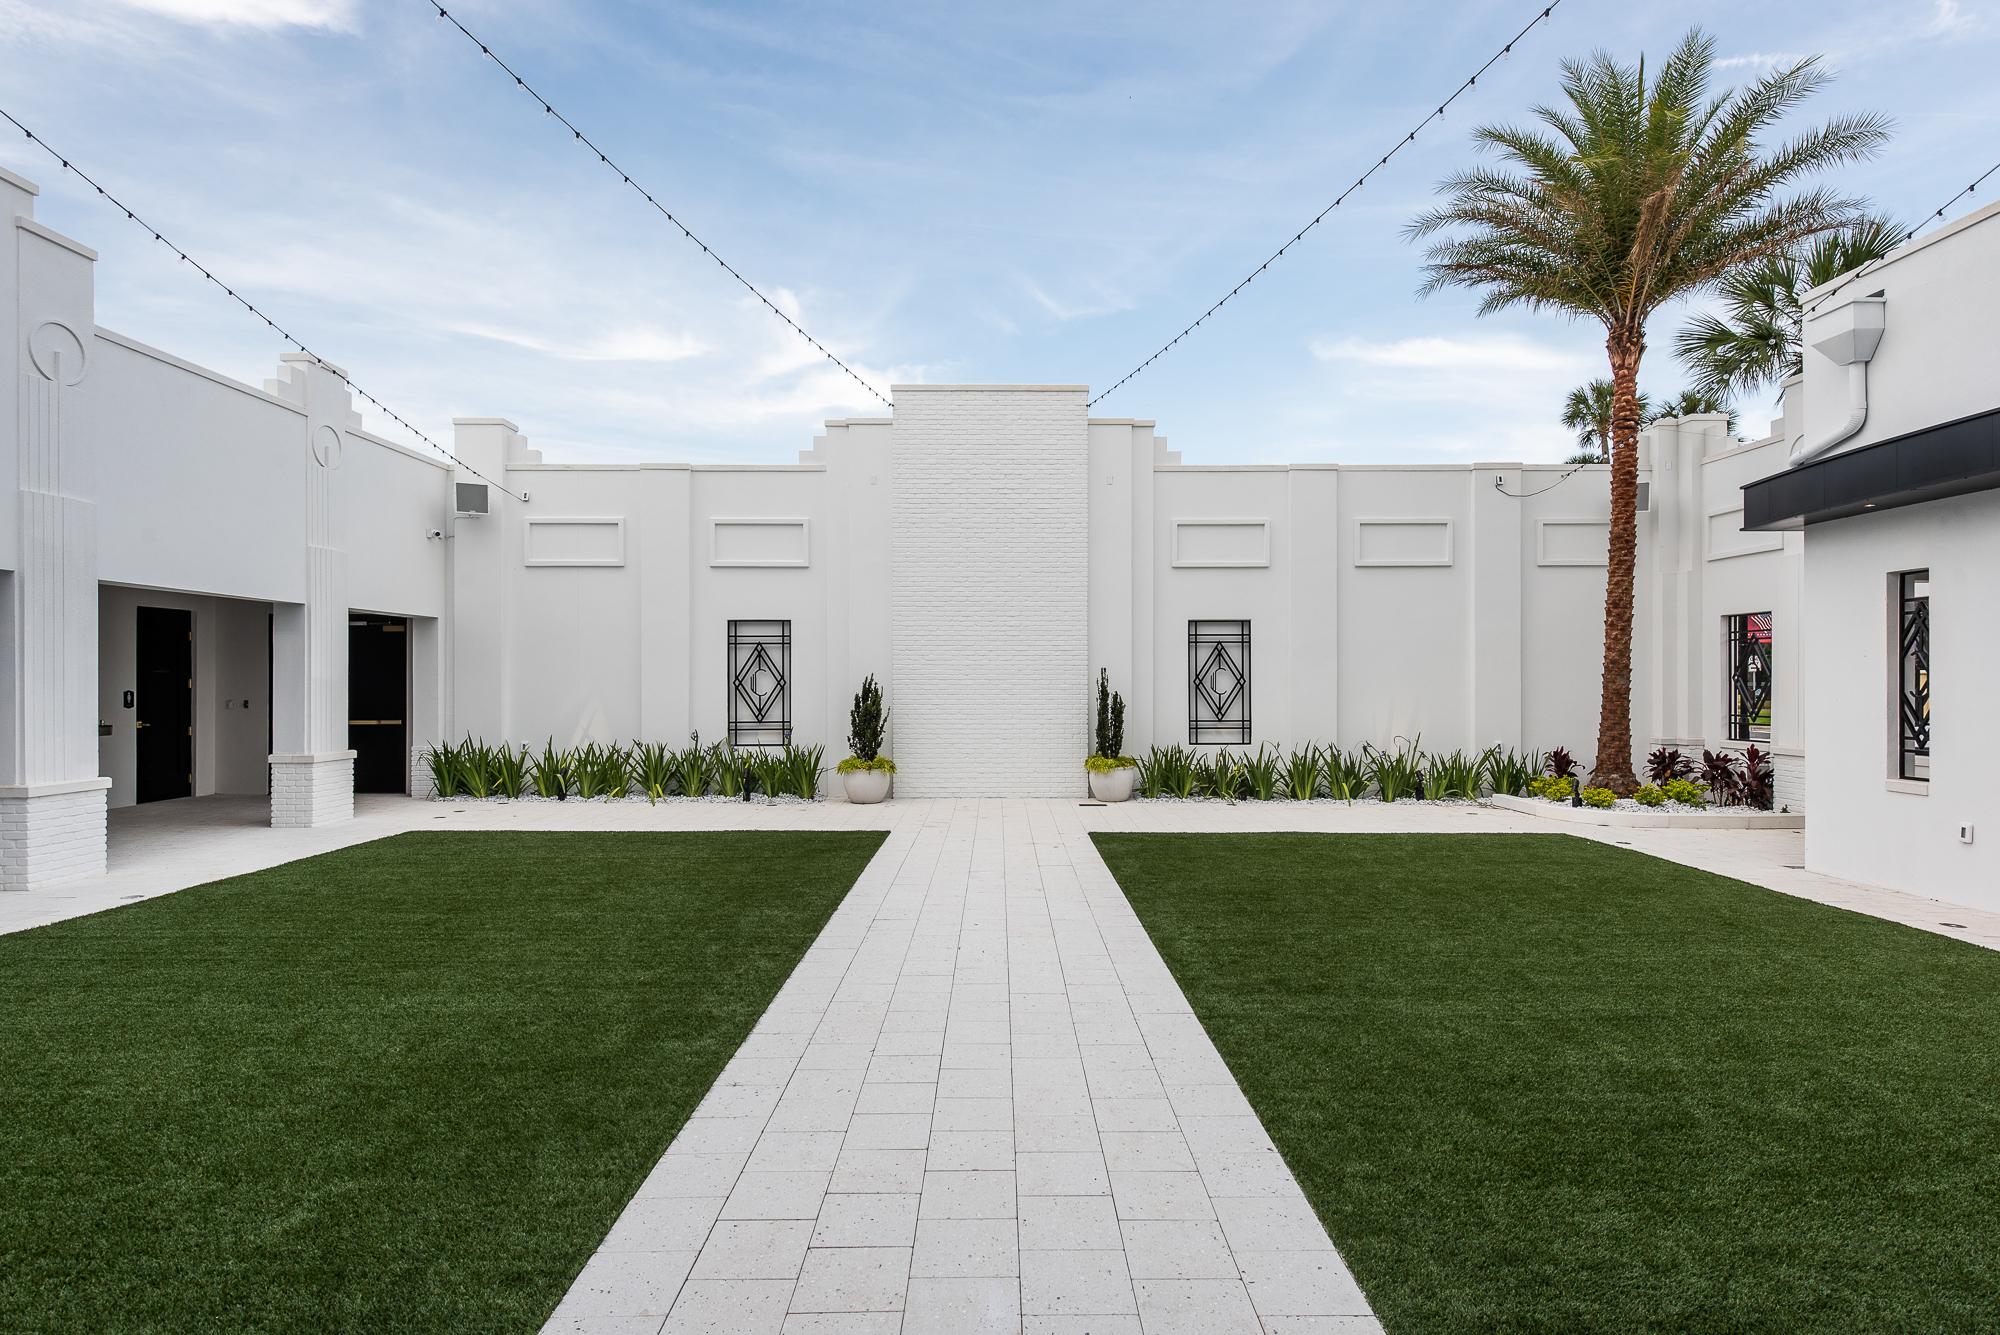 Micamy Design Studio_Interior Design_Clay Theatre_Event Space_Venue_Wedding_Art Deco_Modern_Groom_Catering Kitchen_Altar_Signage_Courtyard_Grass.jpg